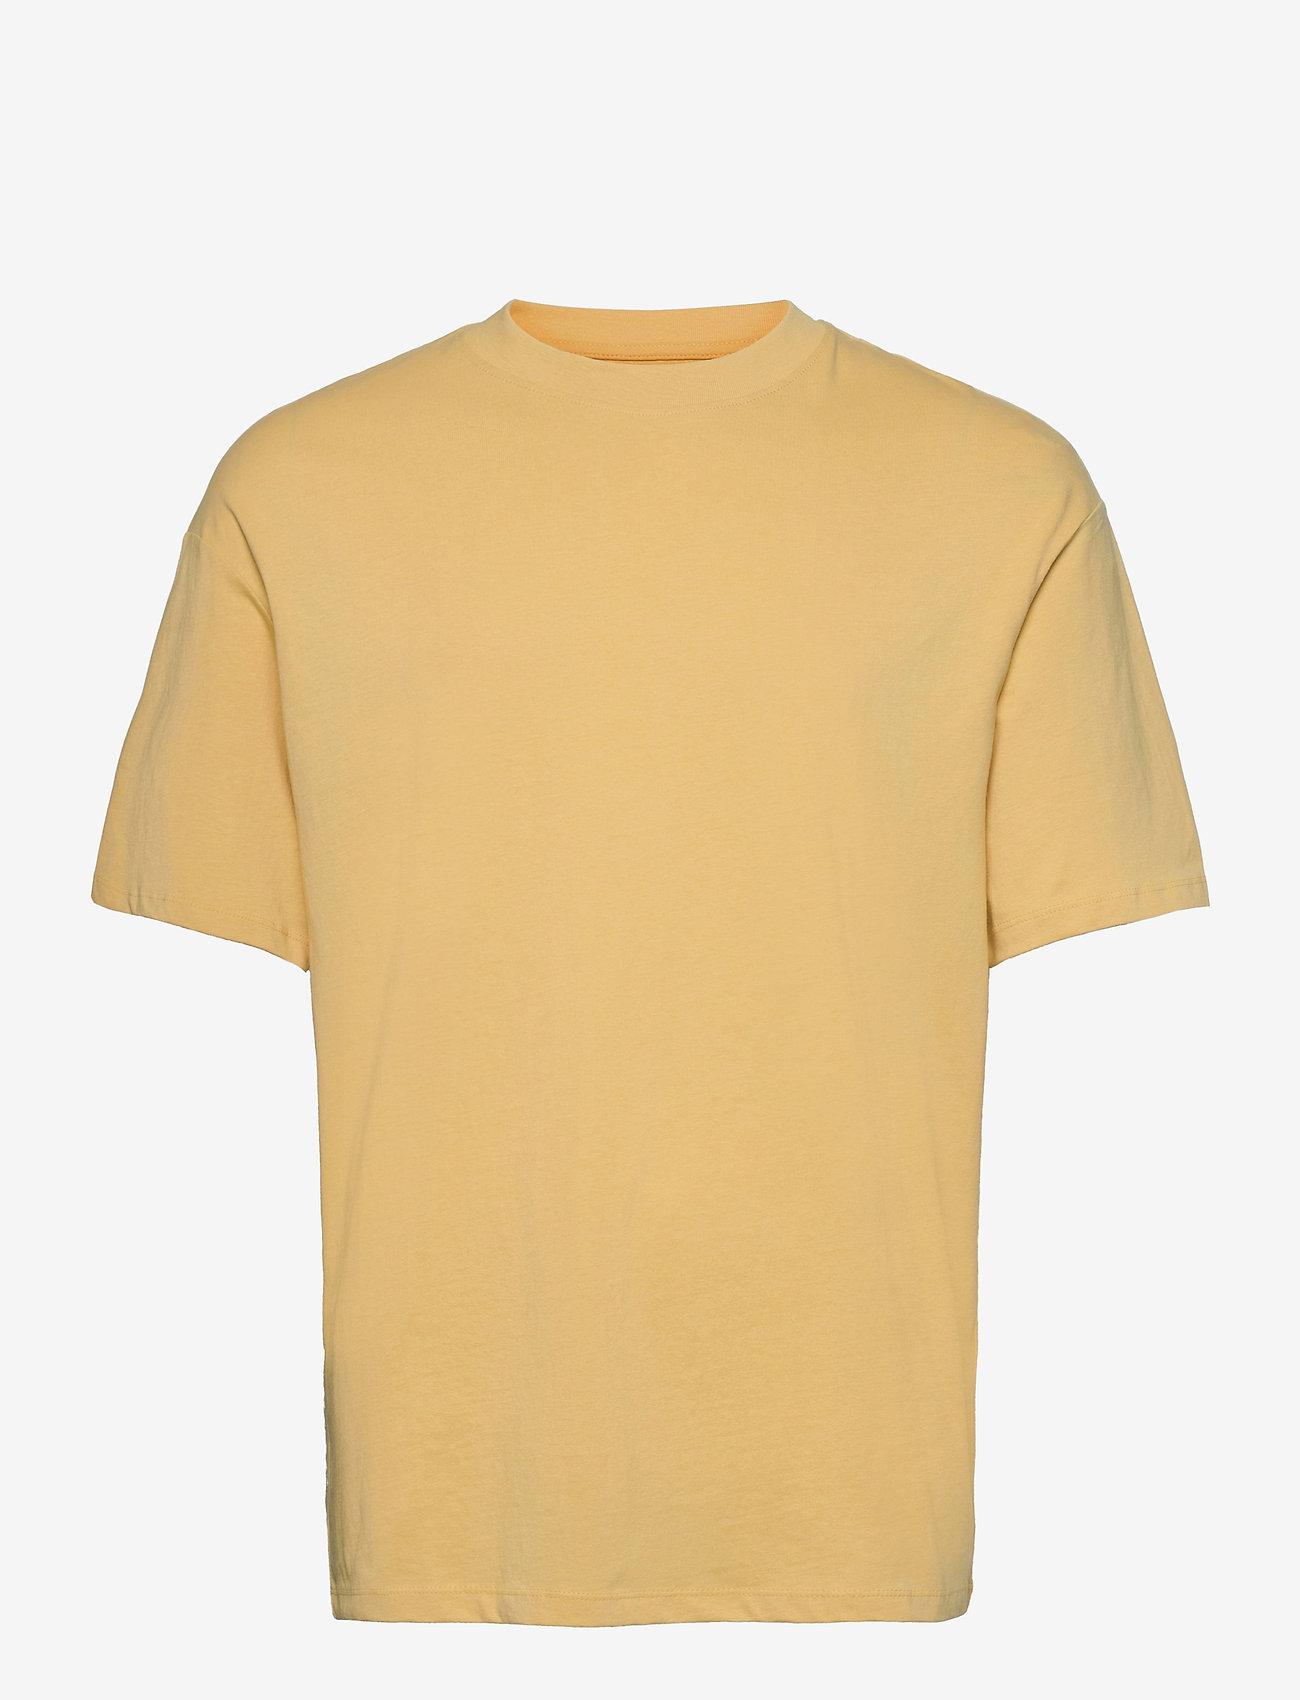 Jack & Jones - JORBRINK TEE SS CREW NECK - basic t-shirts - sahara sun - 0